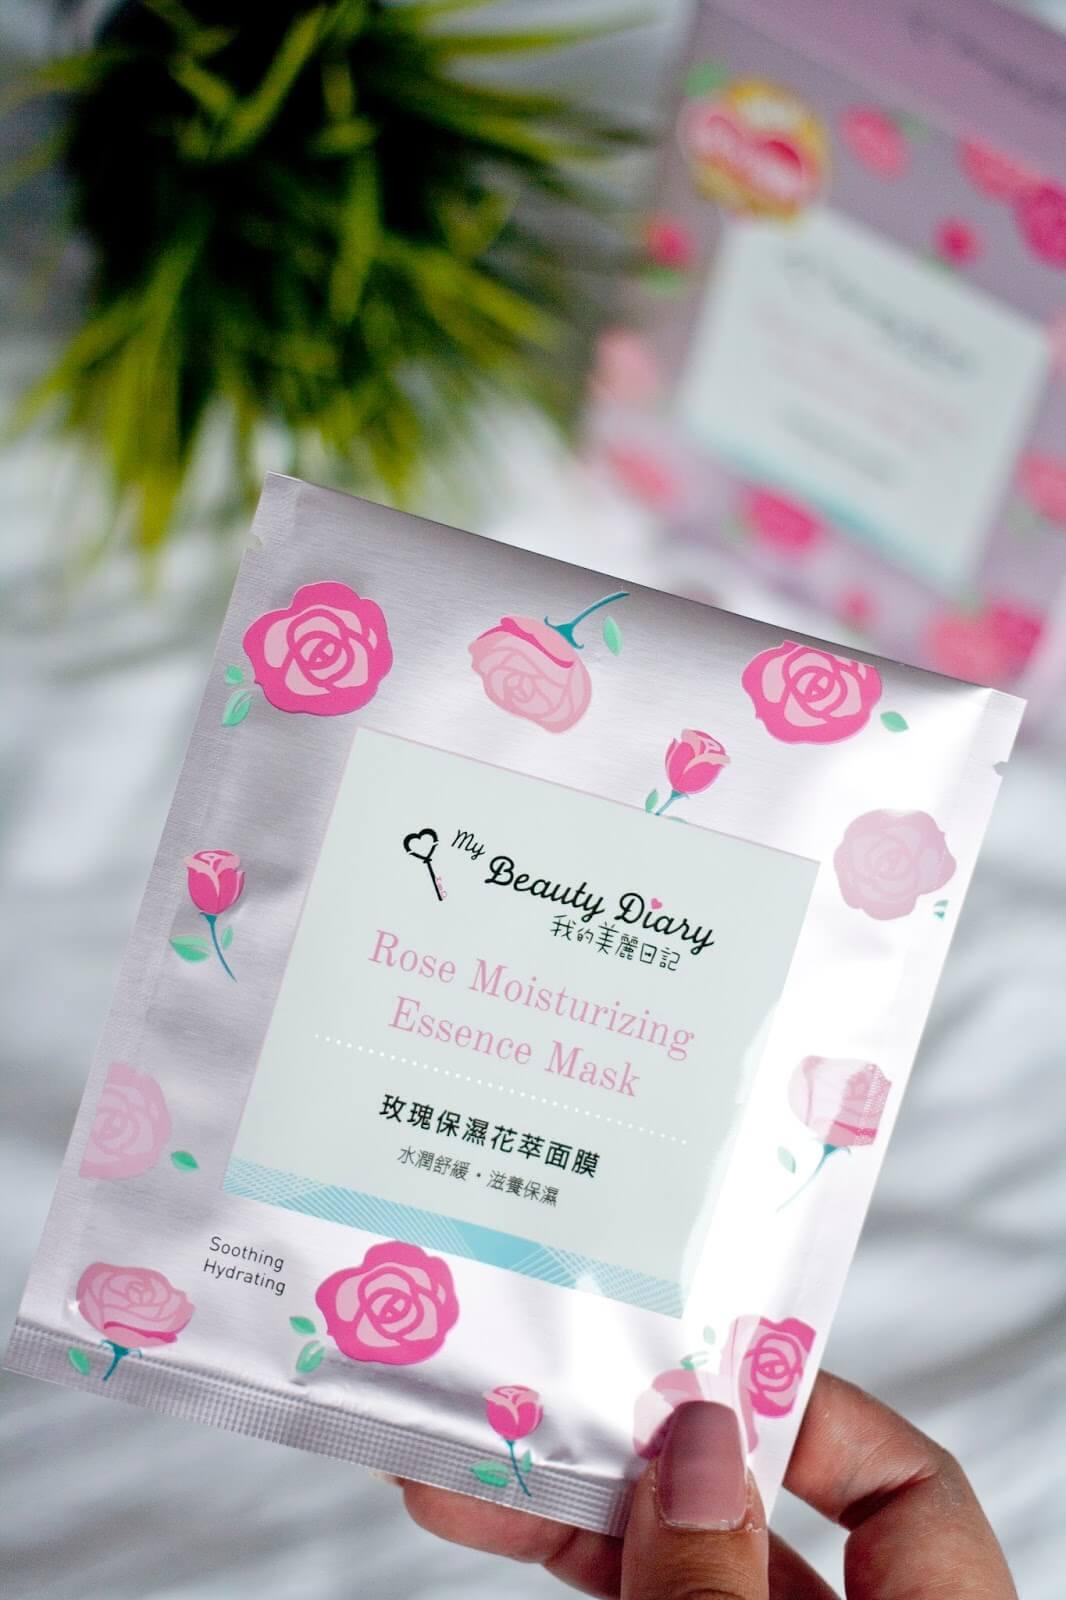 My Beauty Diary ,  Rose Moisturizing , Rose Moisturizing Essence Mask , มาส์กสารสกัดจากดอกกุหลาบ , ปราศจากแอลกอฮอล์ 100%